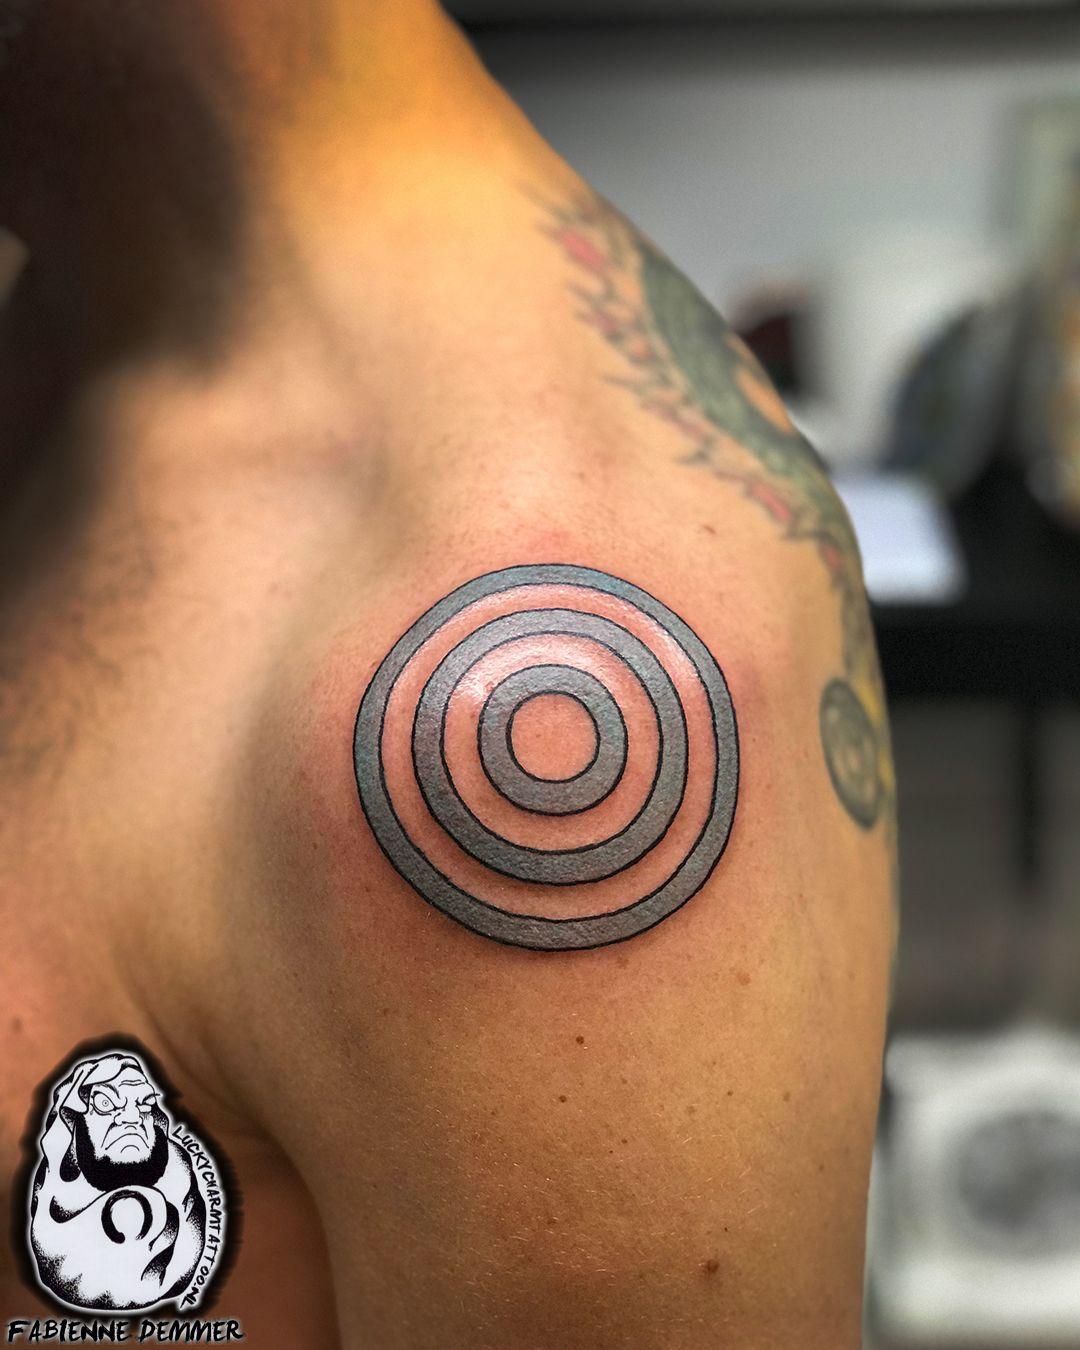 For info or appointments -> info@luckycharmtattoo.nl  @fabienne_lctattoo @lucky_charm_tattoo  #amsterdamtattoo #tattoo #tattooamsterdam #tattoolife #tattooshop #inkedup #holland #tattoodo #tattoogirls #colortattoo #blackwork #blackworkerssubmission #GoVegan #blackandgreytattoo #iblackwork #onlyblackart #btattooing #blacktattoomag #dotwork #stippling #flashaddicted #tttism #taot #inkig #femaletattooartist #tattoosnob #oldlines #circles